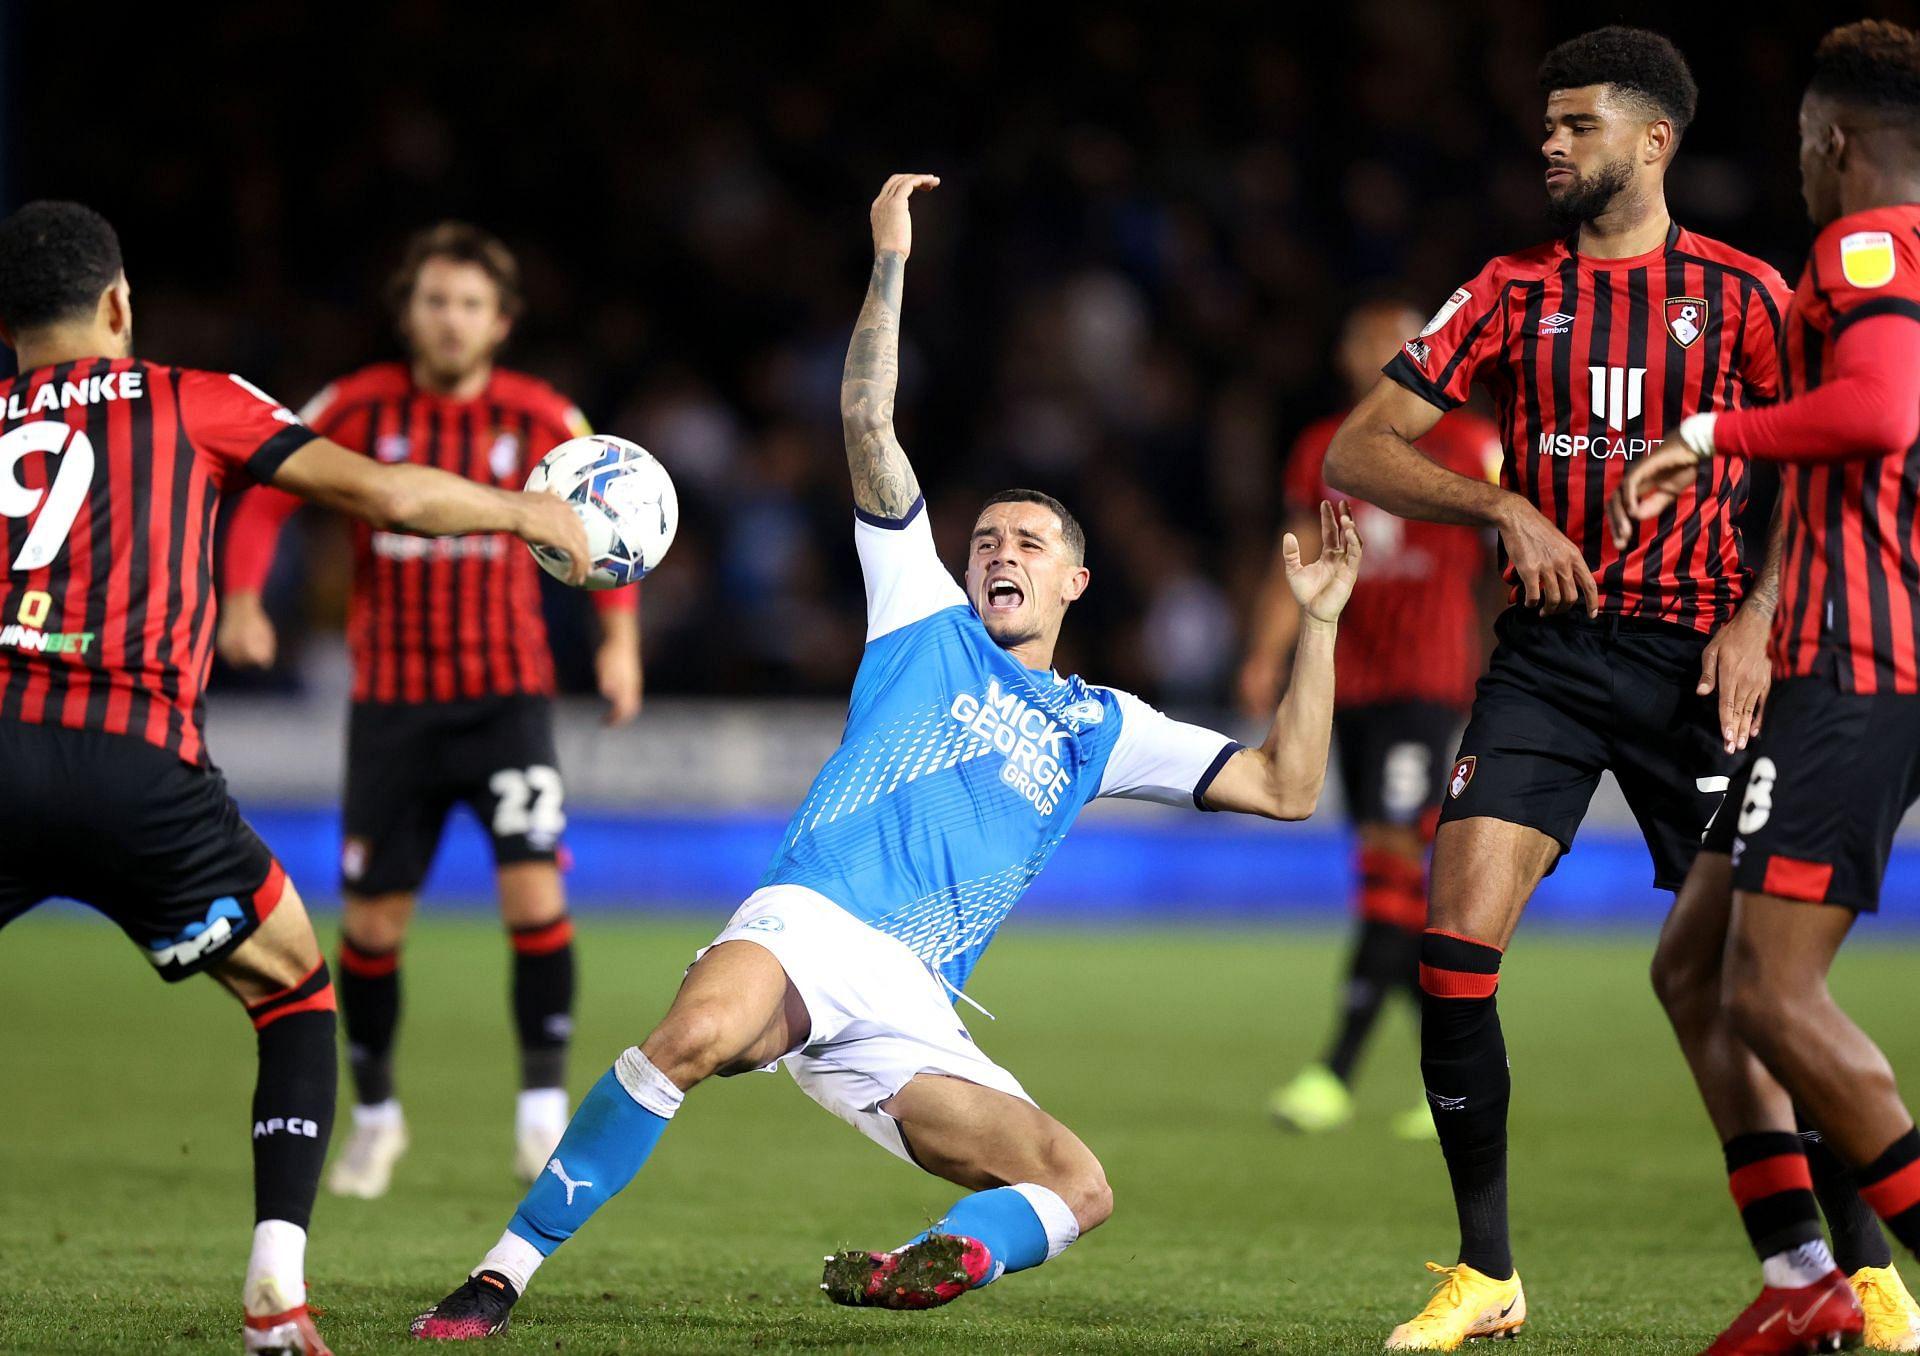 Bristol City take on Bournemouth at the Ashton Gate Stadium